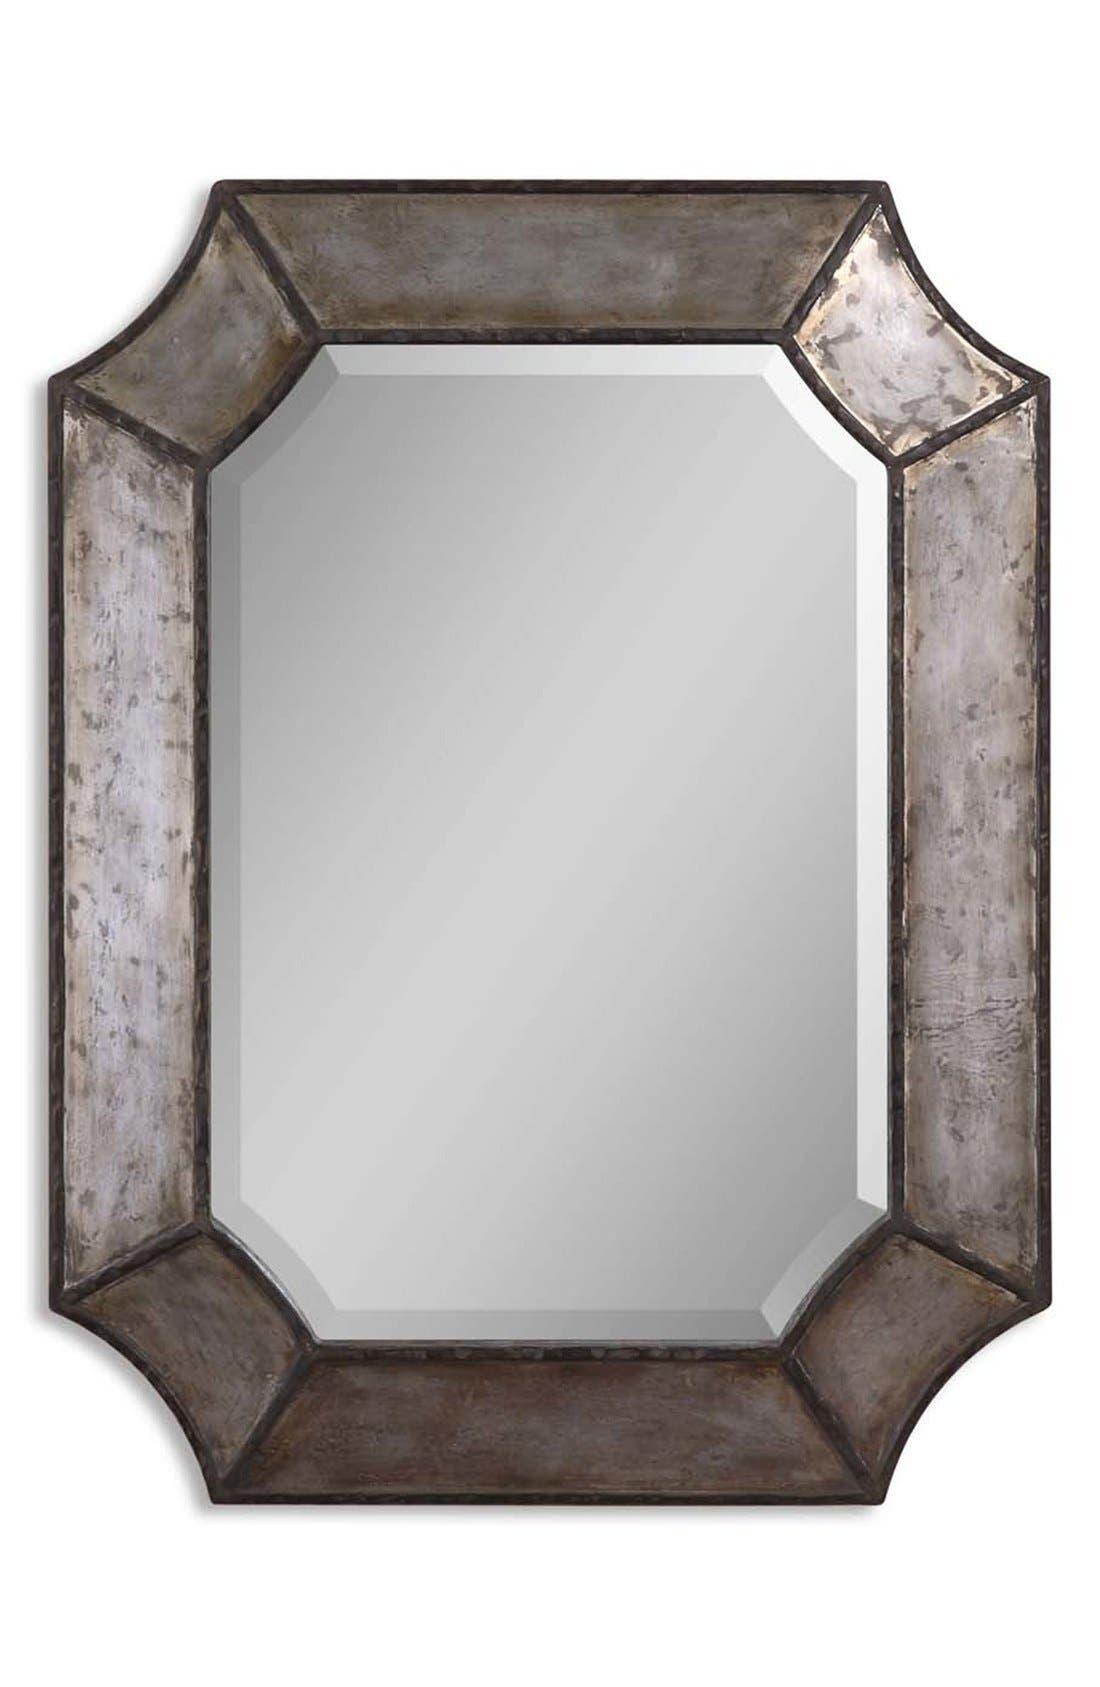 'Elliot' Distressed Mirror,                             Main thumbnail 1, color,                             020